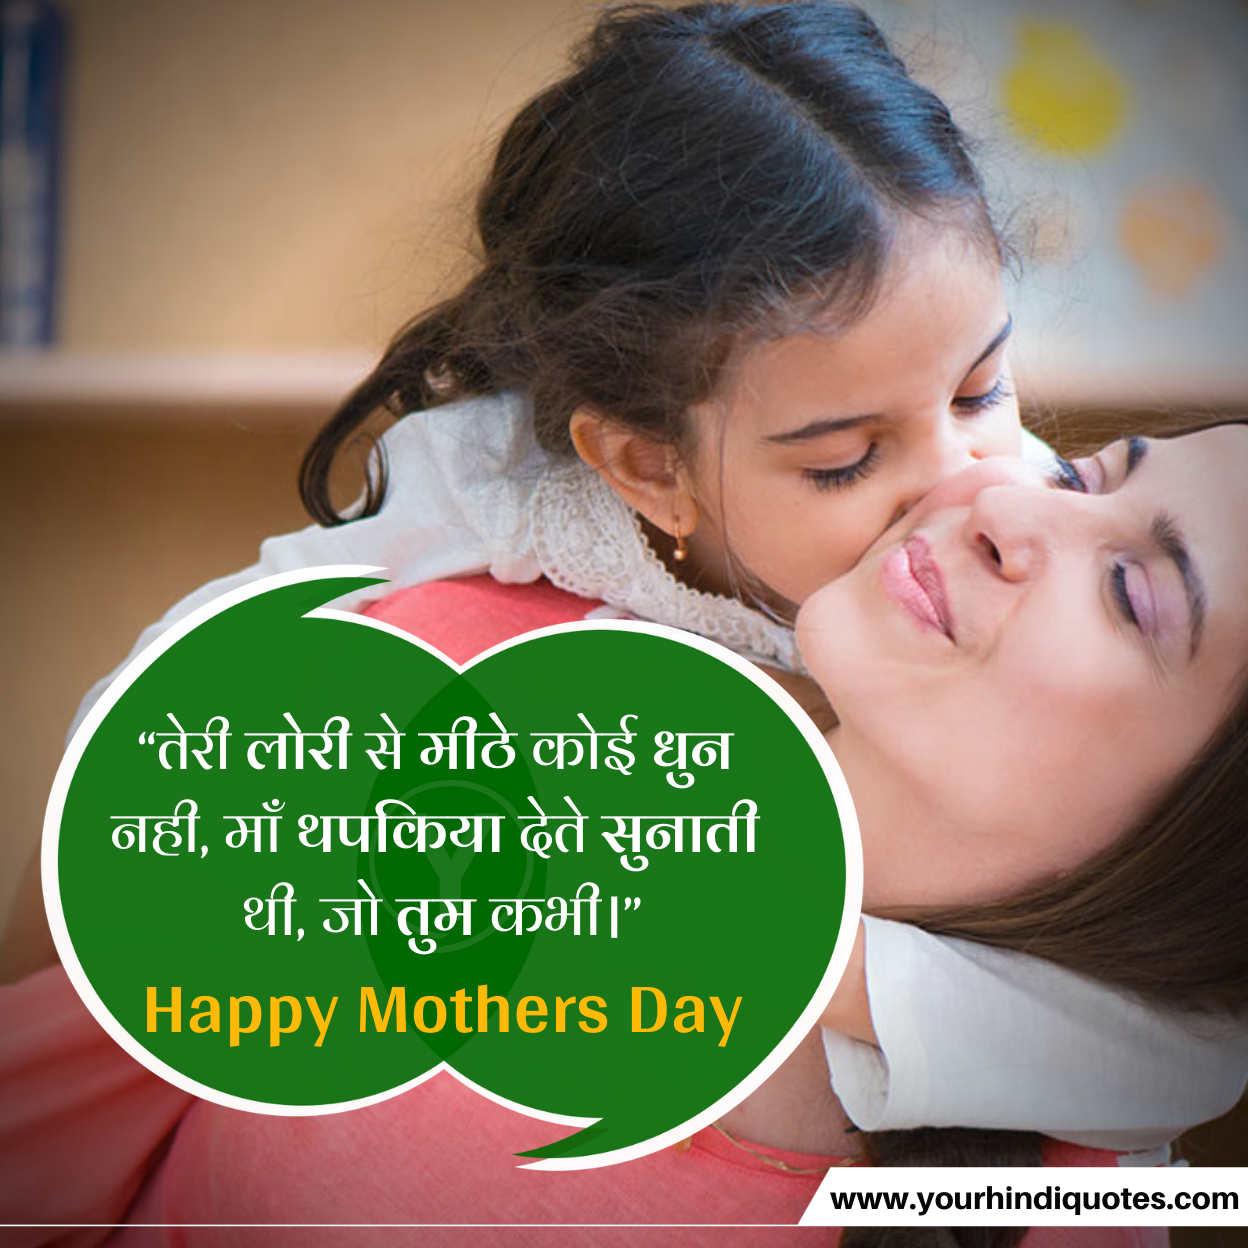 Mothers Day Quotes Hindi Photos